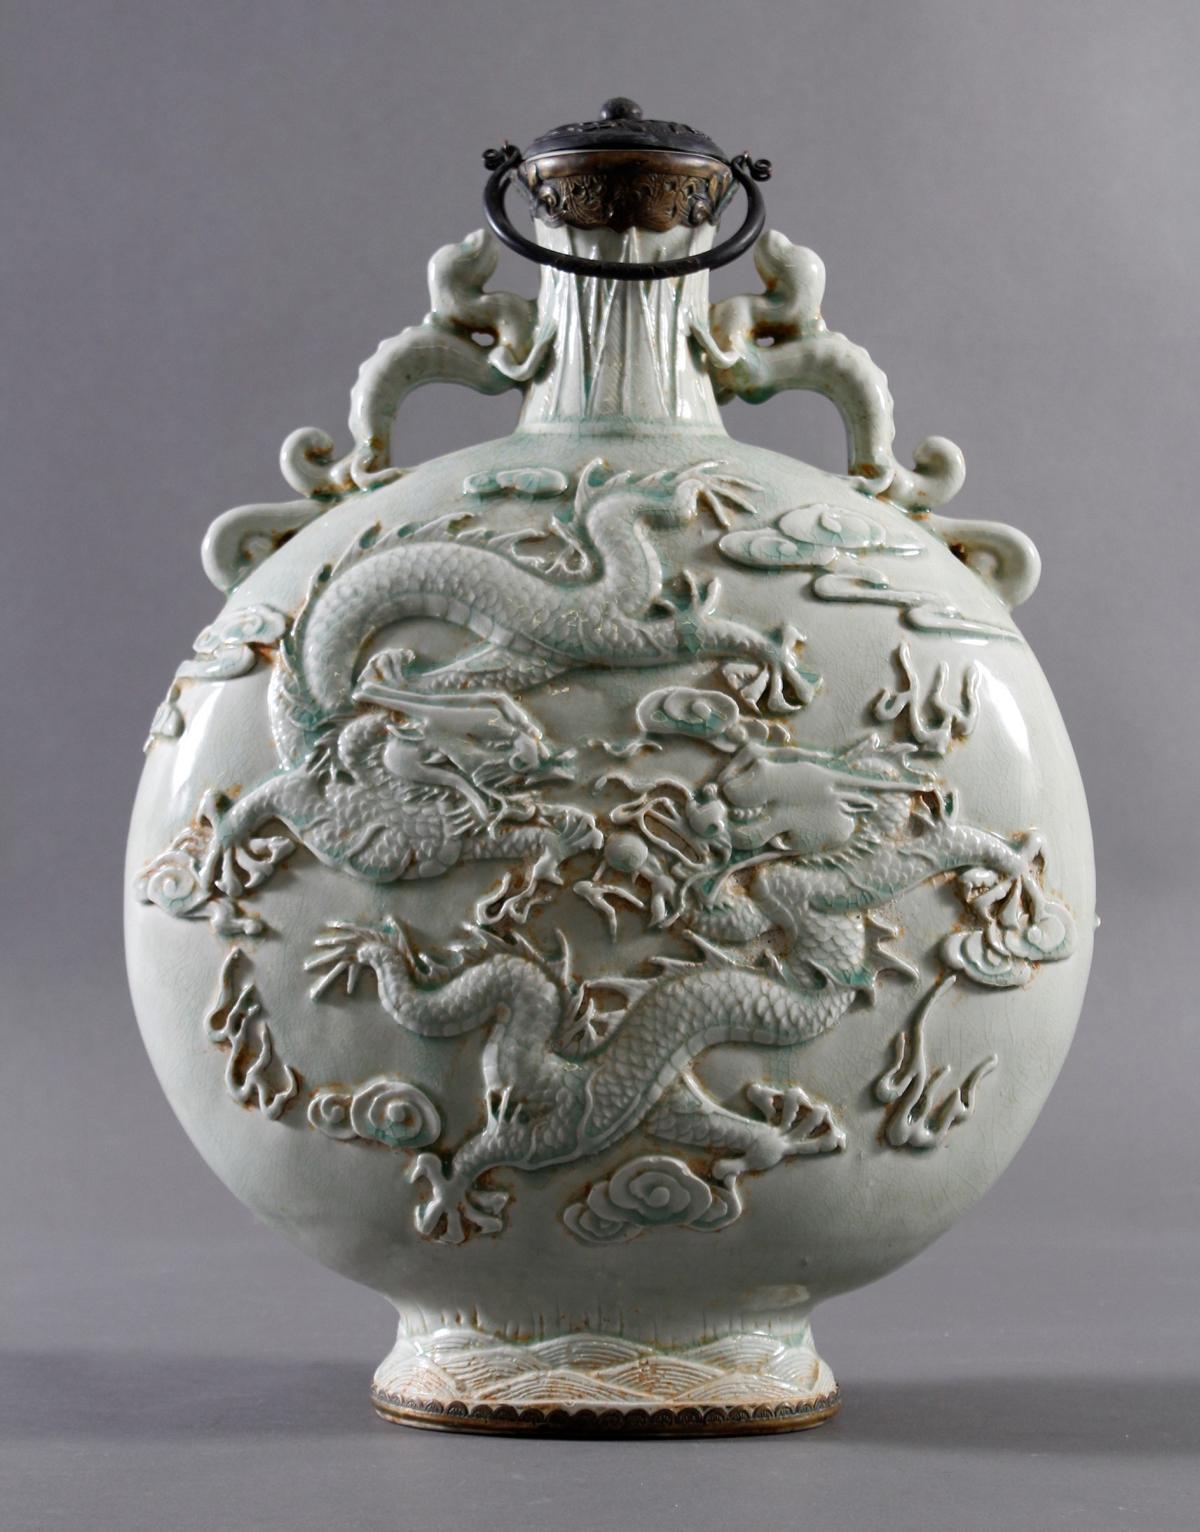 Große seladonfarbene Mondflasche, China, 1. Hälfte 20. Jahrhundert